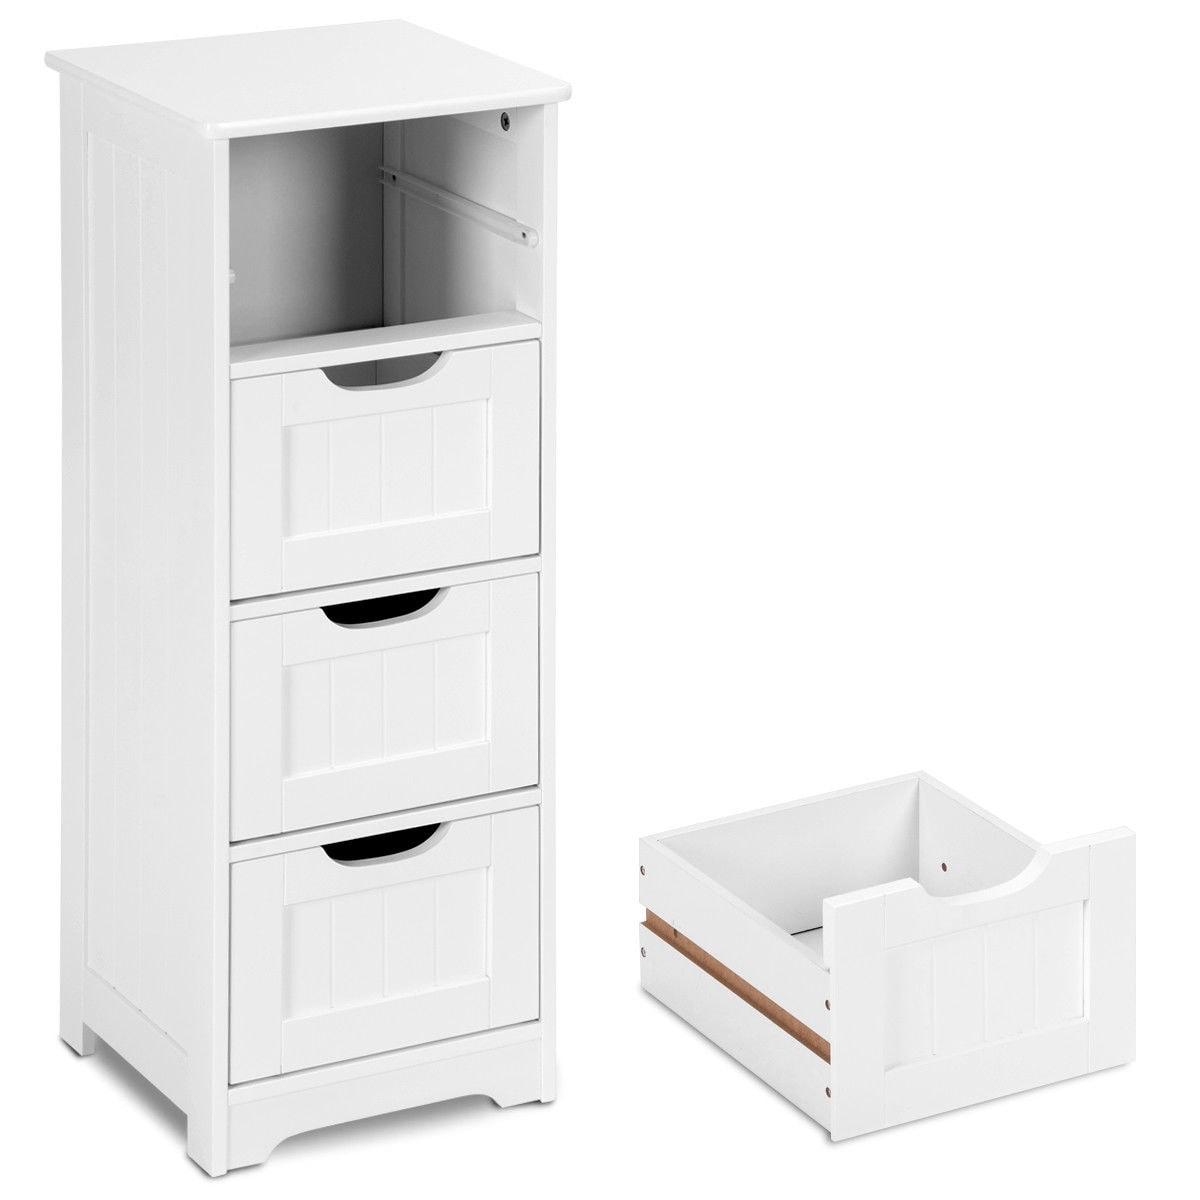 Bathroom Floor Cabinet Storage Organizer with 4 Drawers Free Standing Cabinet